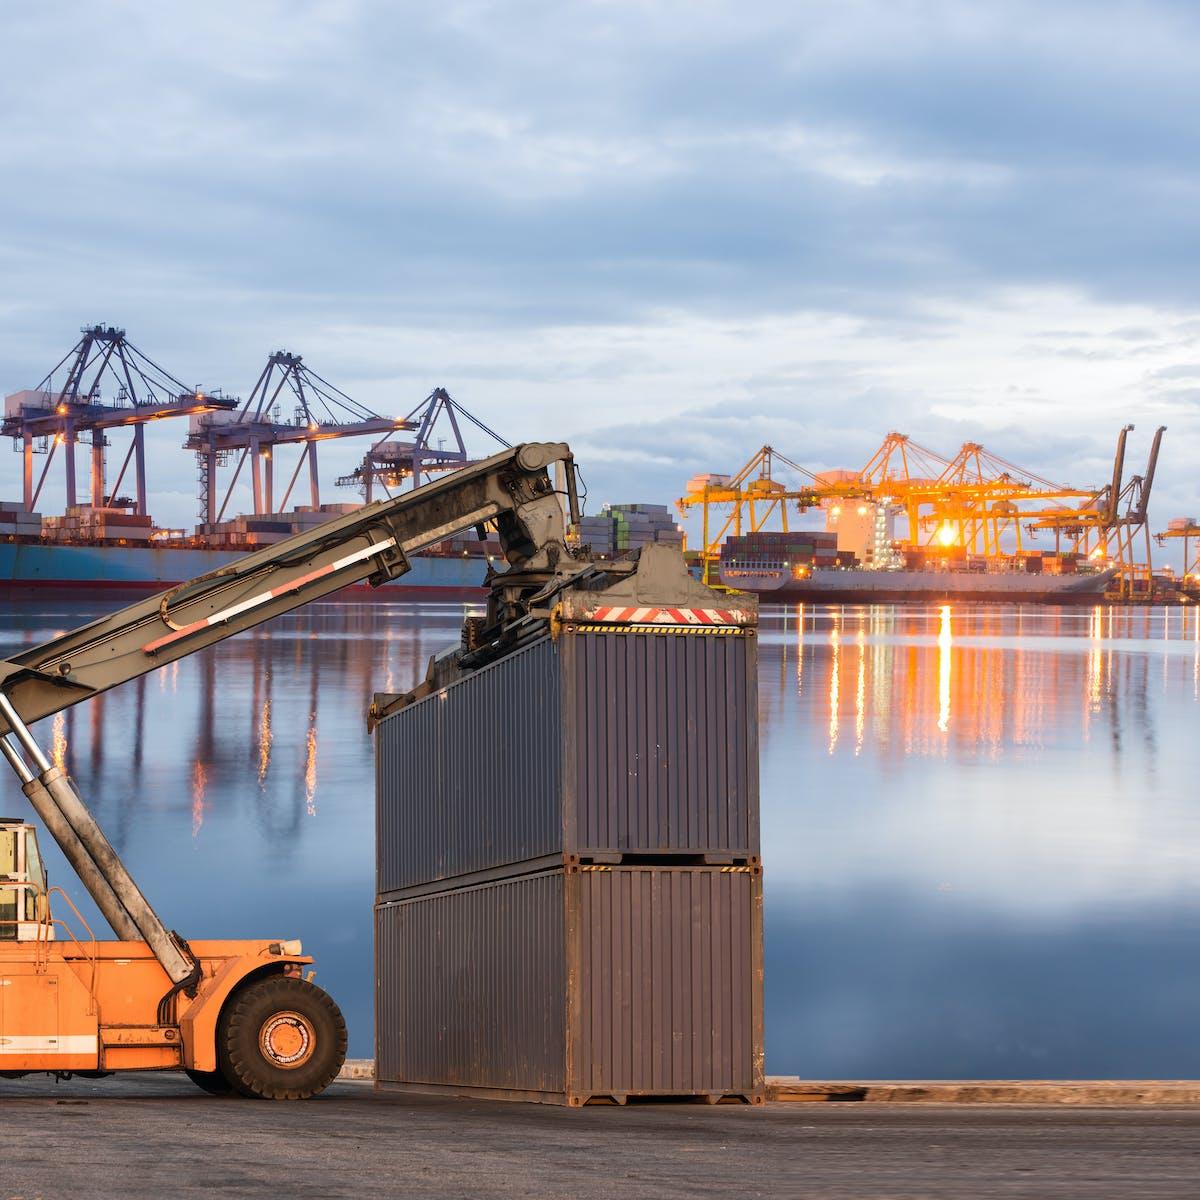 Titelbild-Container-Aussenhandel-Hafen-Trade-Compliance-AdobeStock-106393192-sorapop